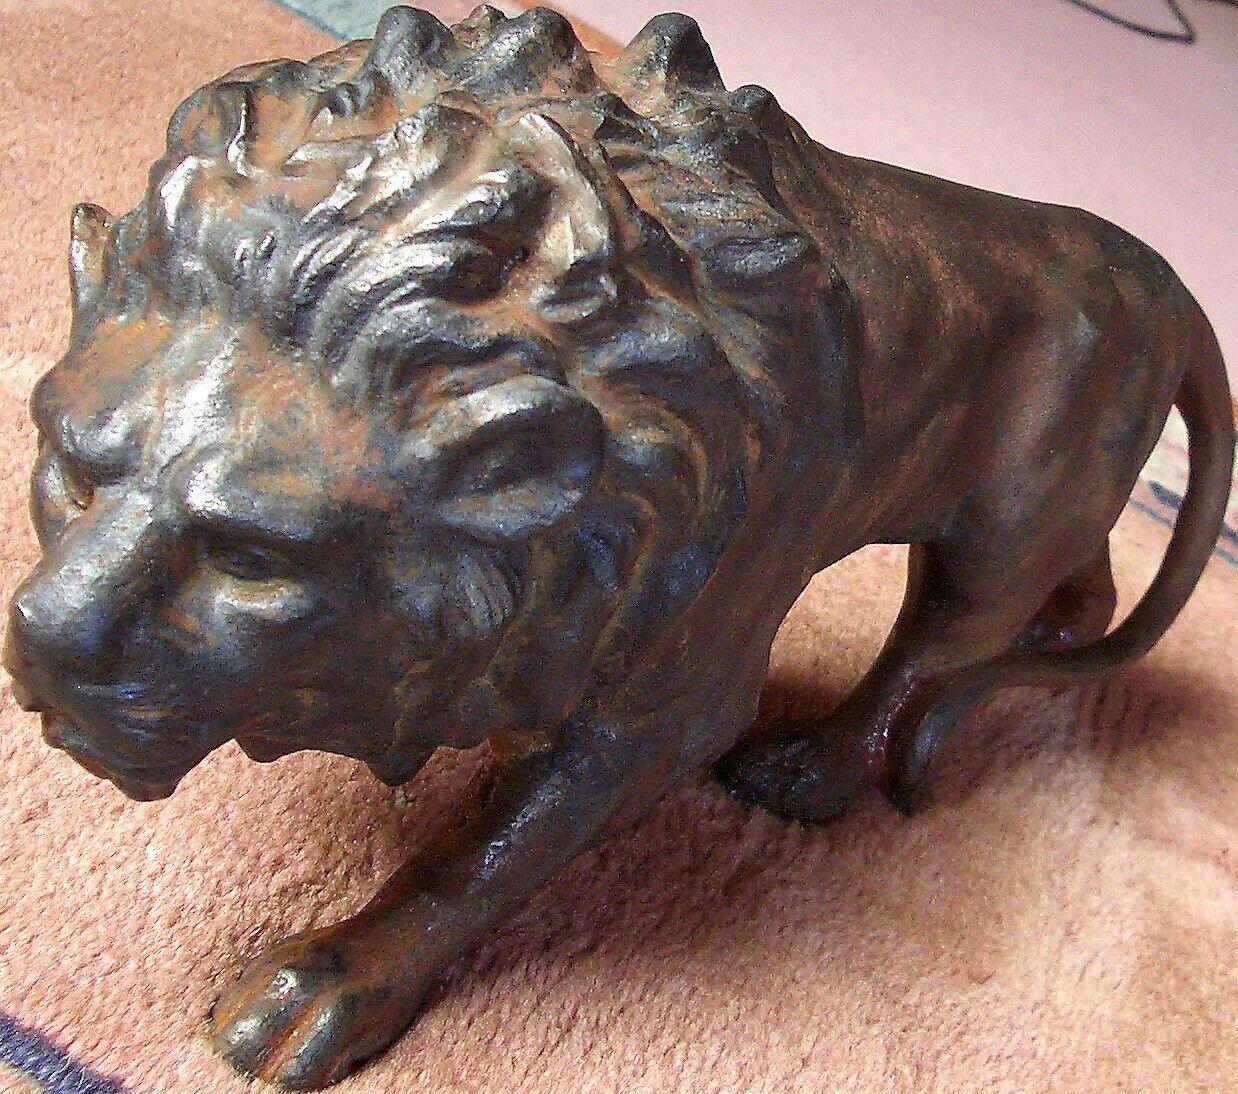 Löwe, Eisen, Eisenklotz, massiver Eisenlöwe, Jagd Safari ca. 8,7 Kilo Türstopper